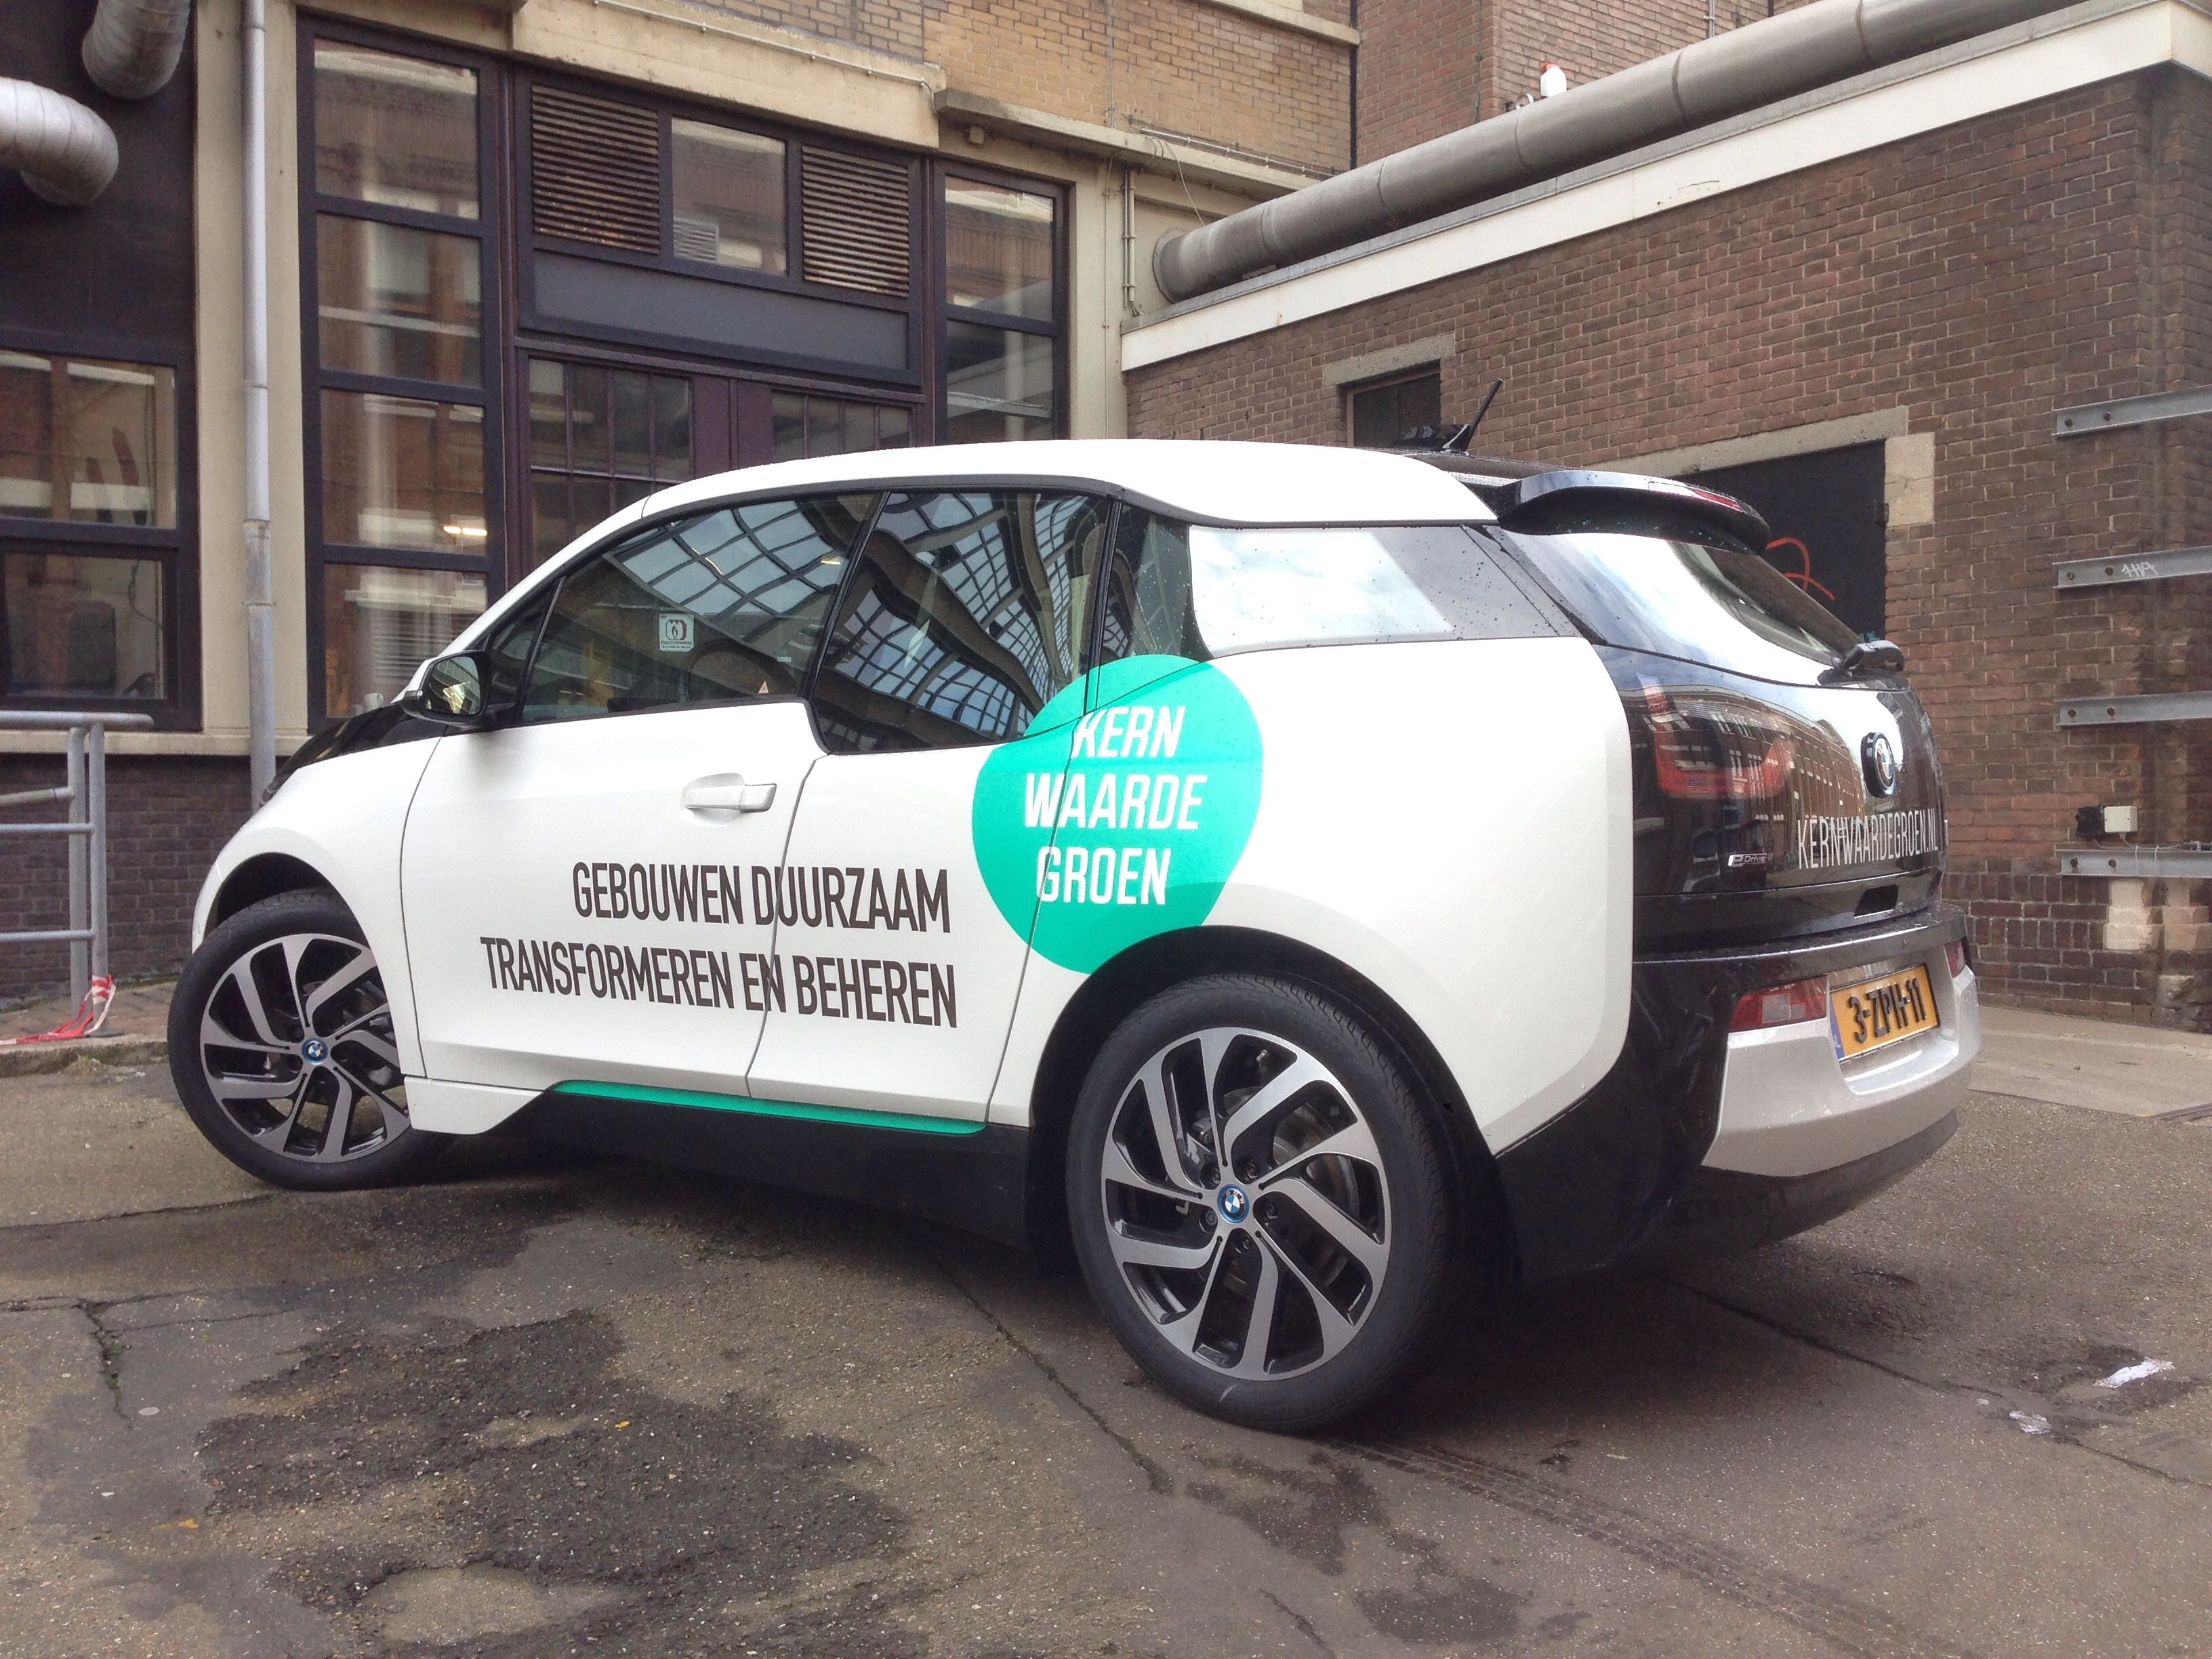 BMWi3 Kernwaarde Groen  #bmwi3 #sustainable #bmw #bmwi #electriccar #holland #polder #igaddict #picture #followme robert_sengers